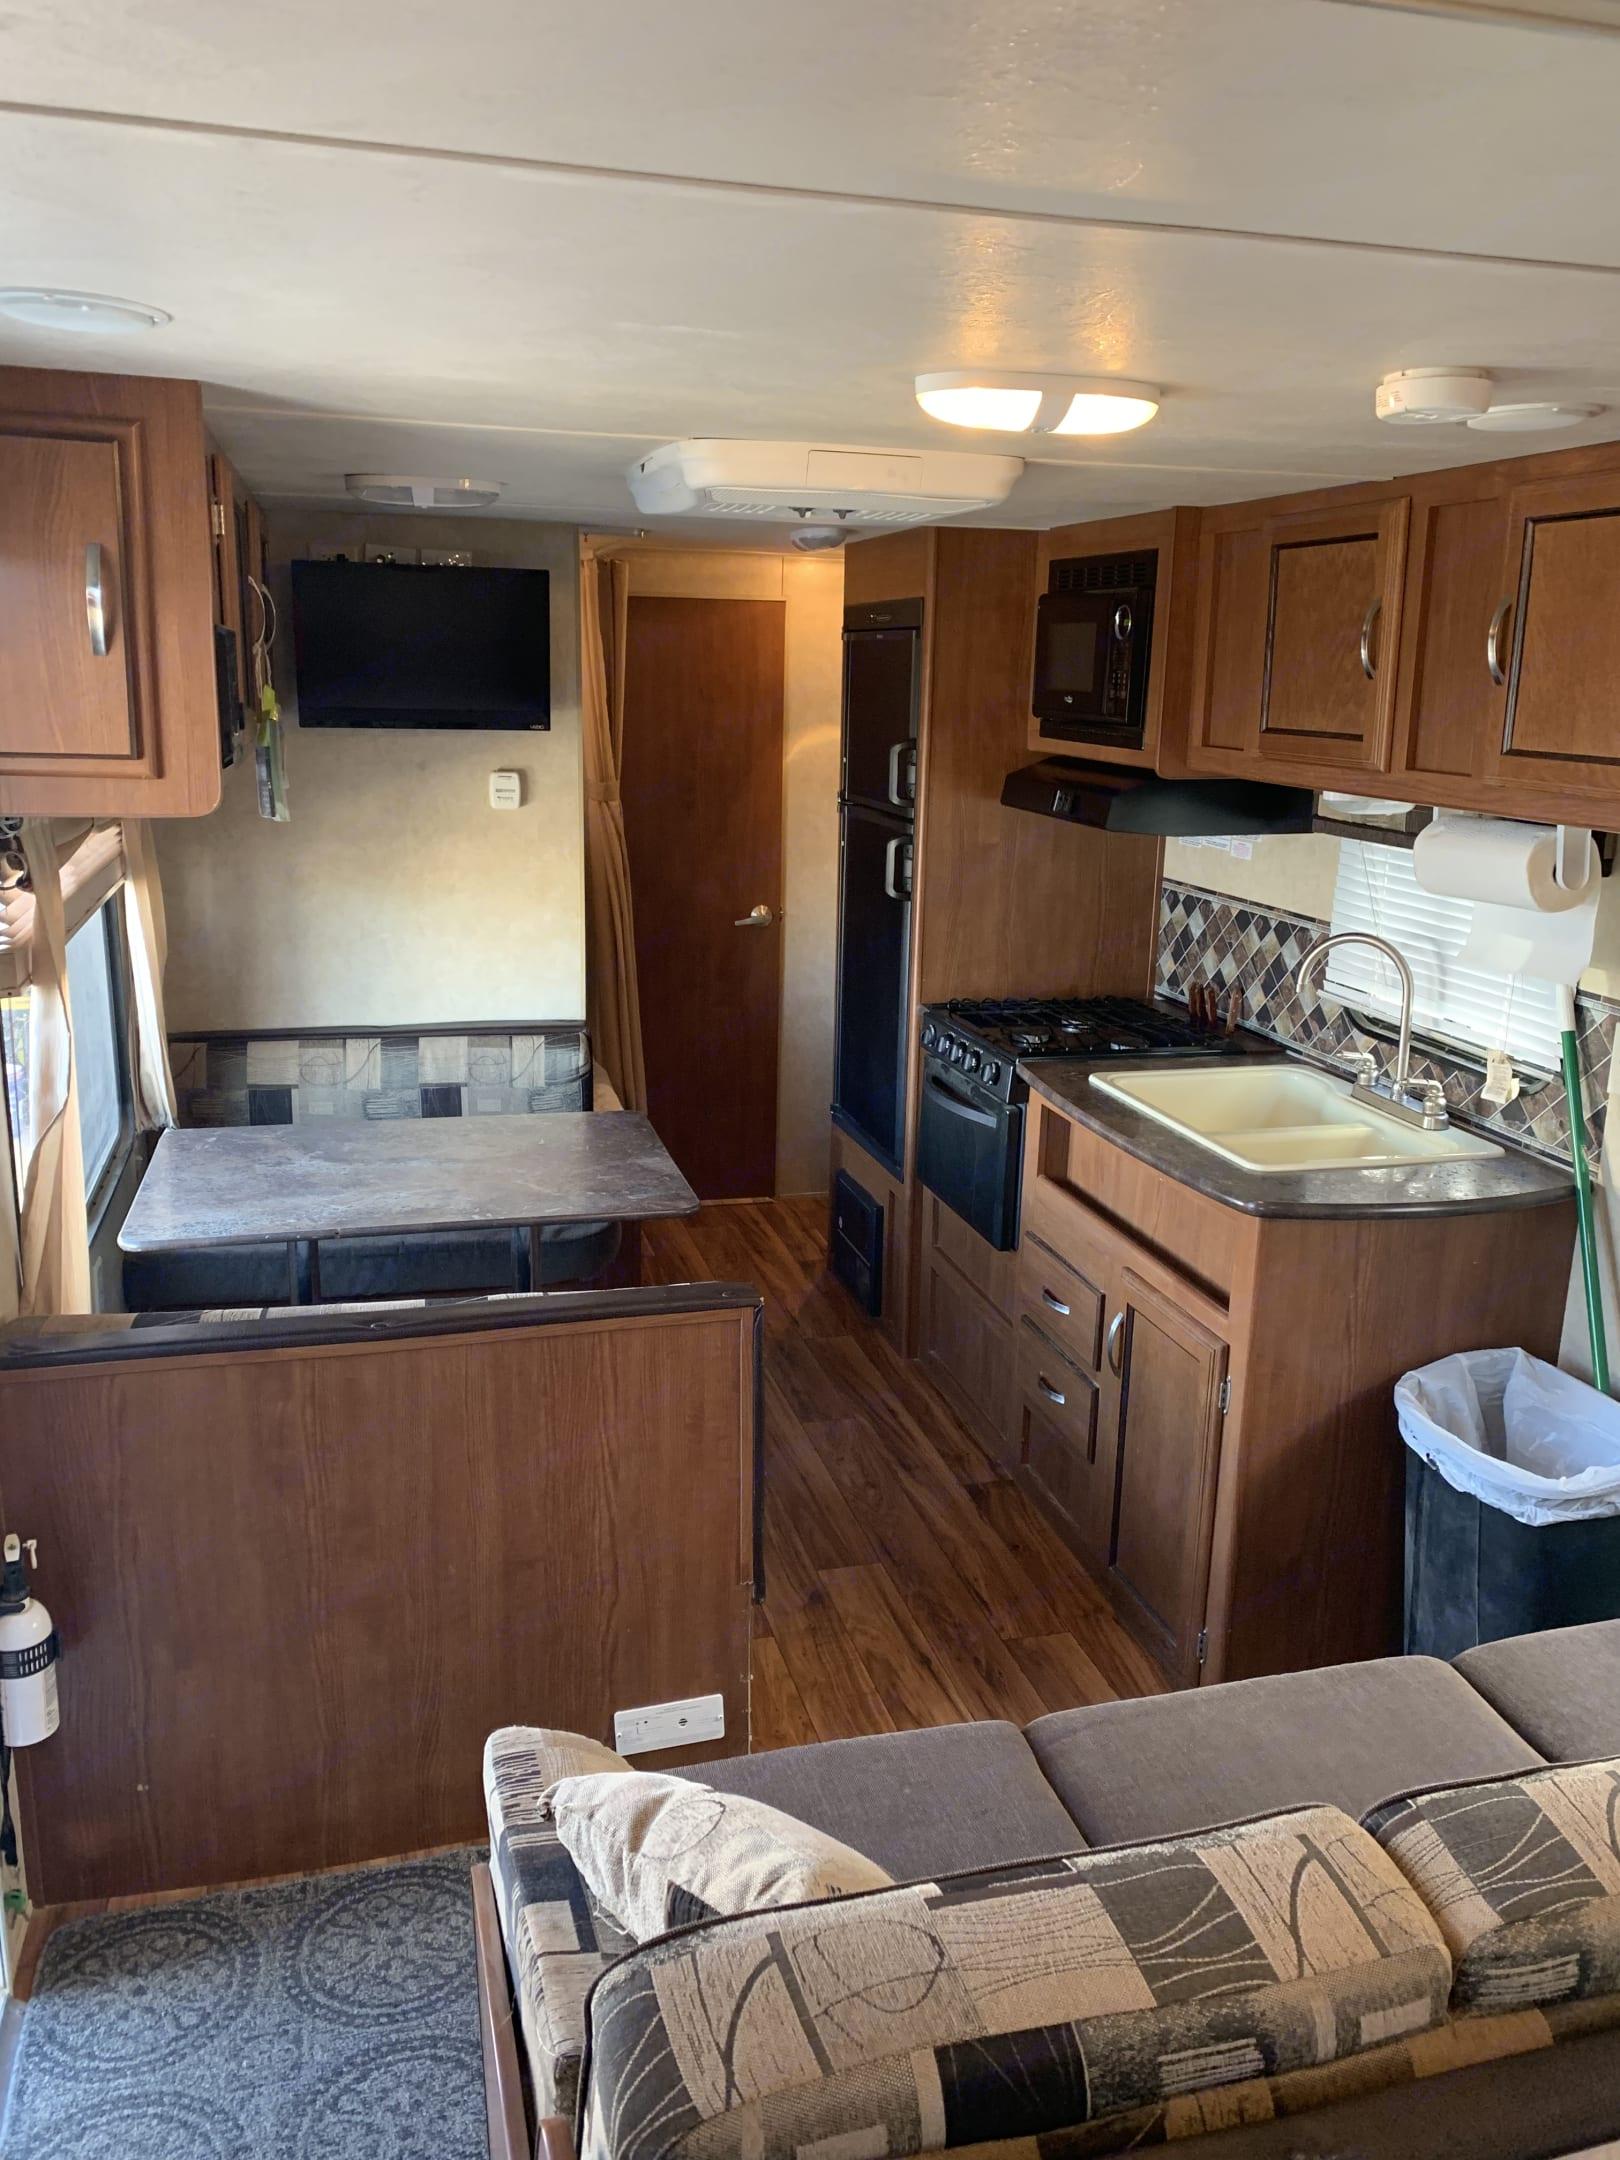 Forest River Inc flagstaff 823D camper trailer 2015